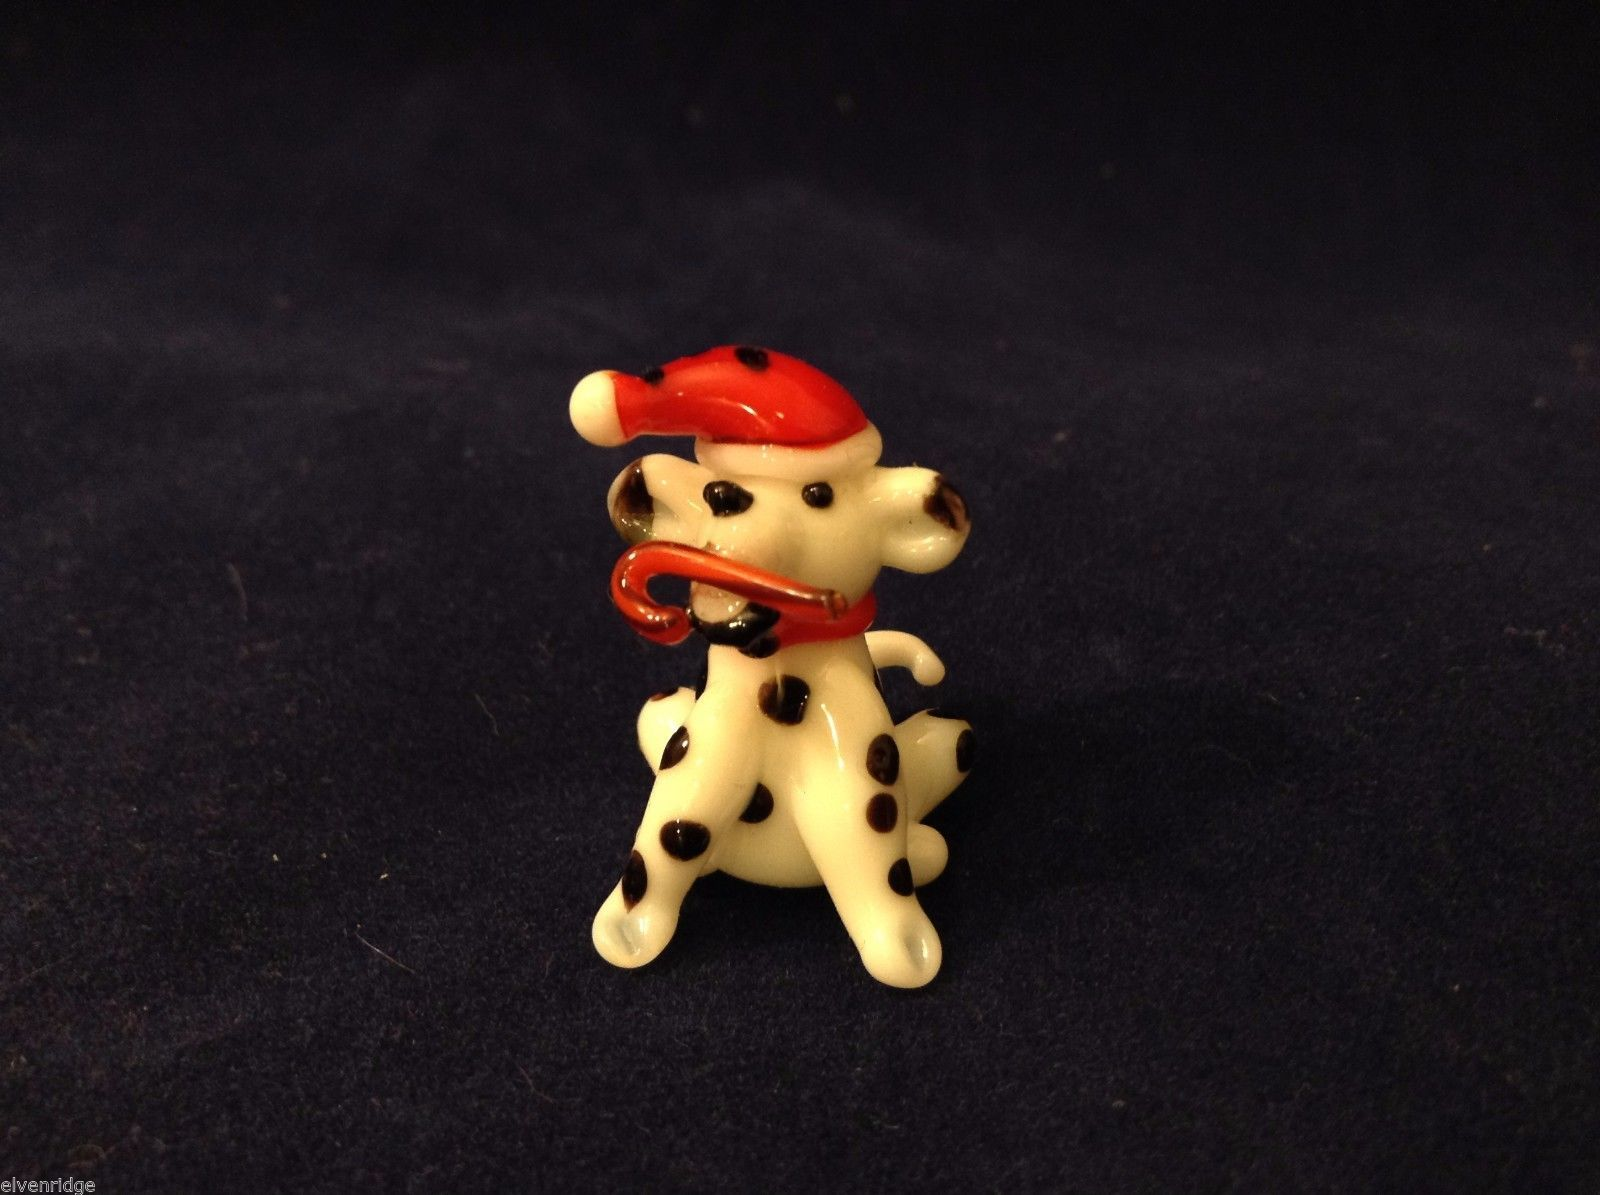 Miniature blown glass figurine Dalmatian dog in elf hat w candy cane USA NIB